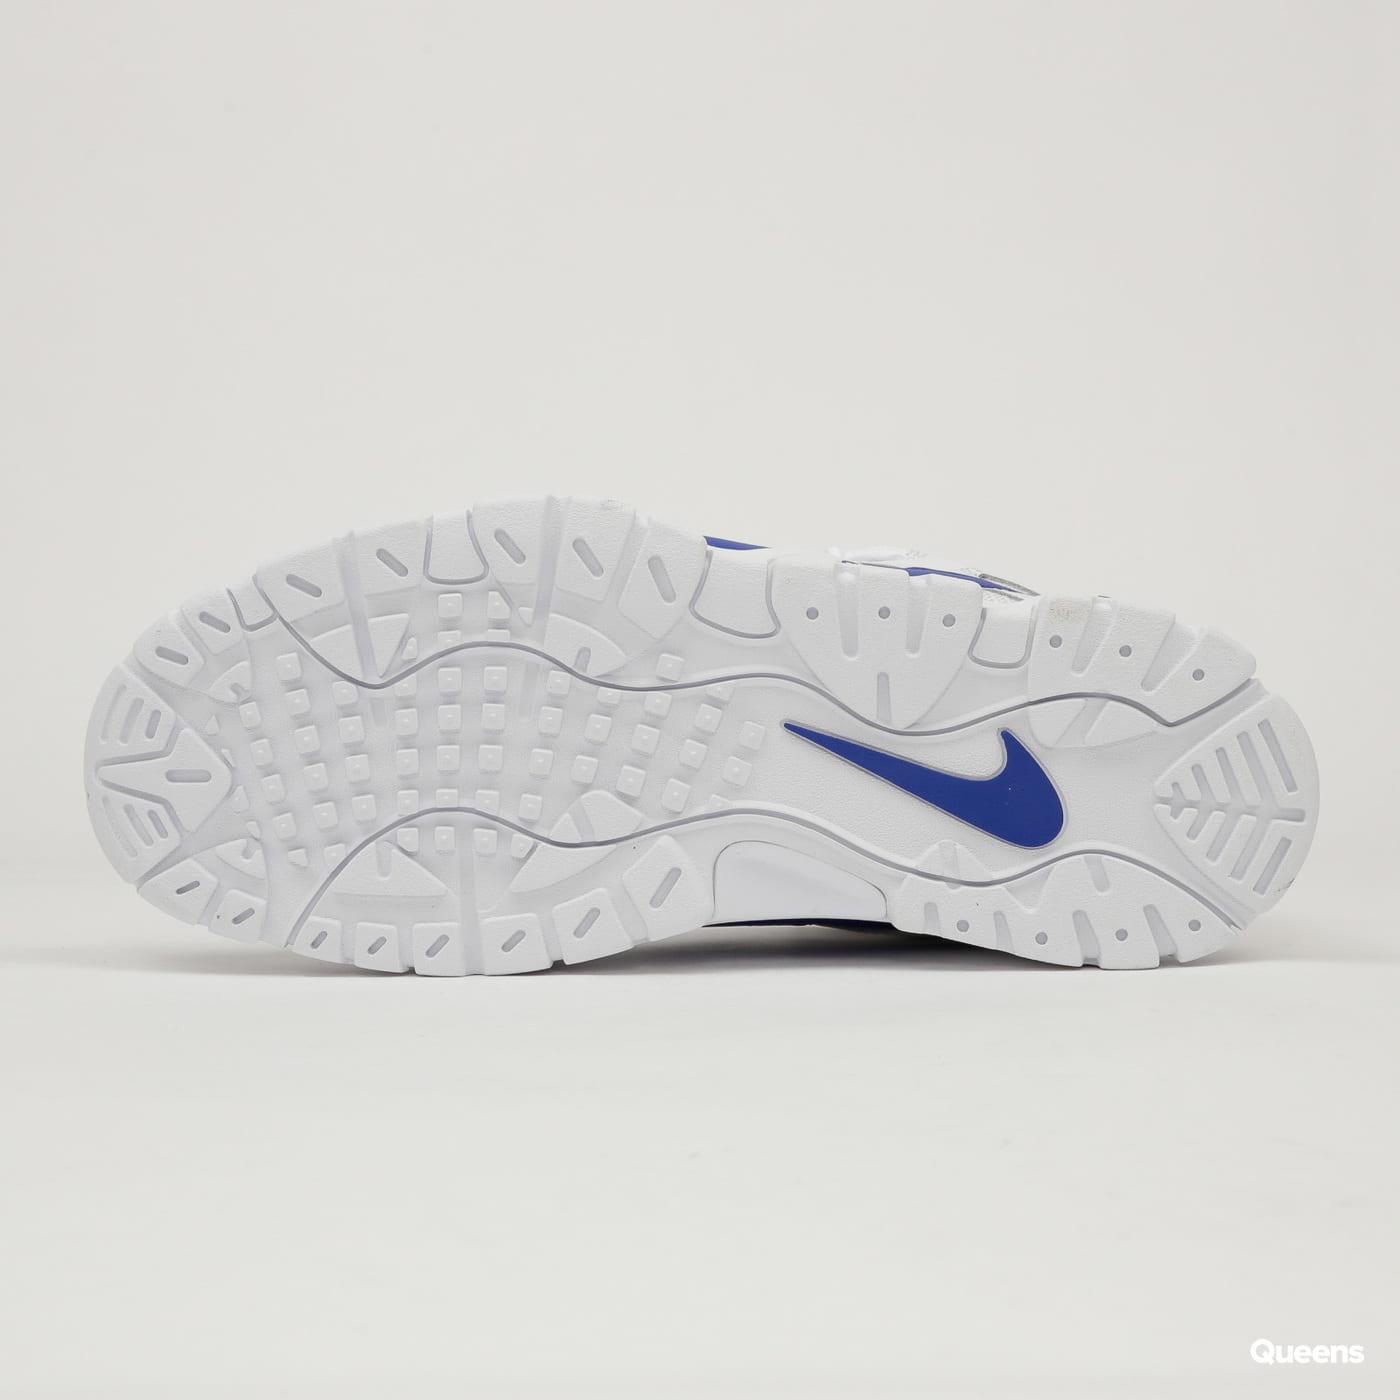 Nike Air Barrage Low white / hyper blue